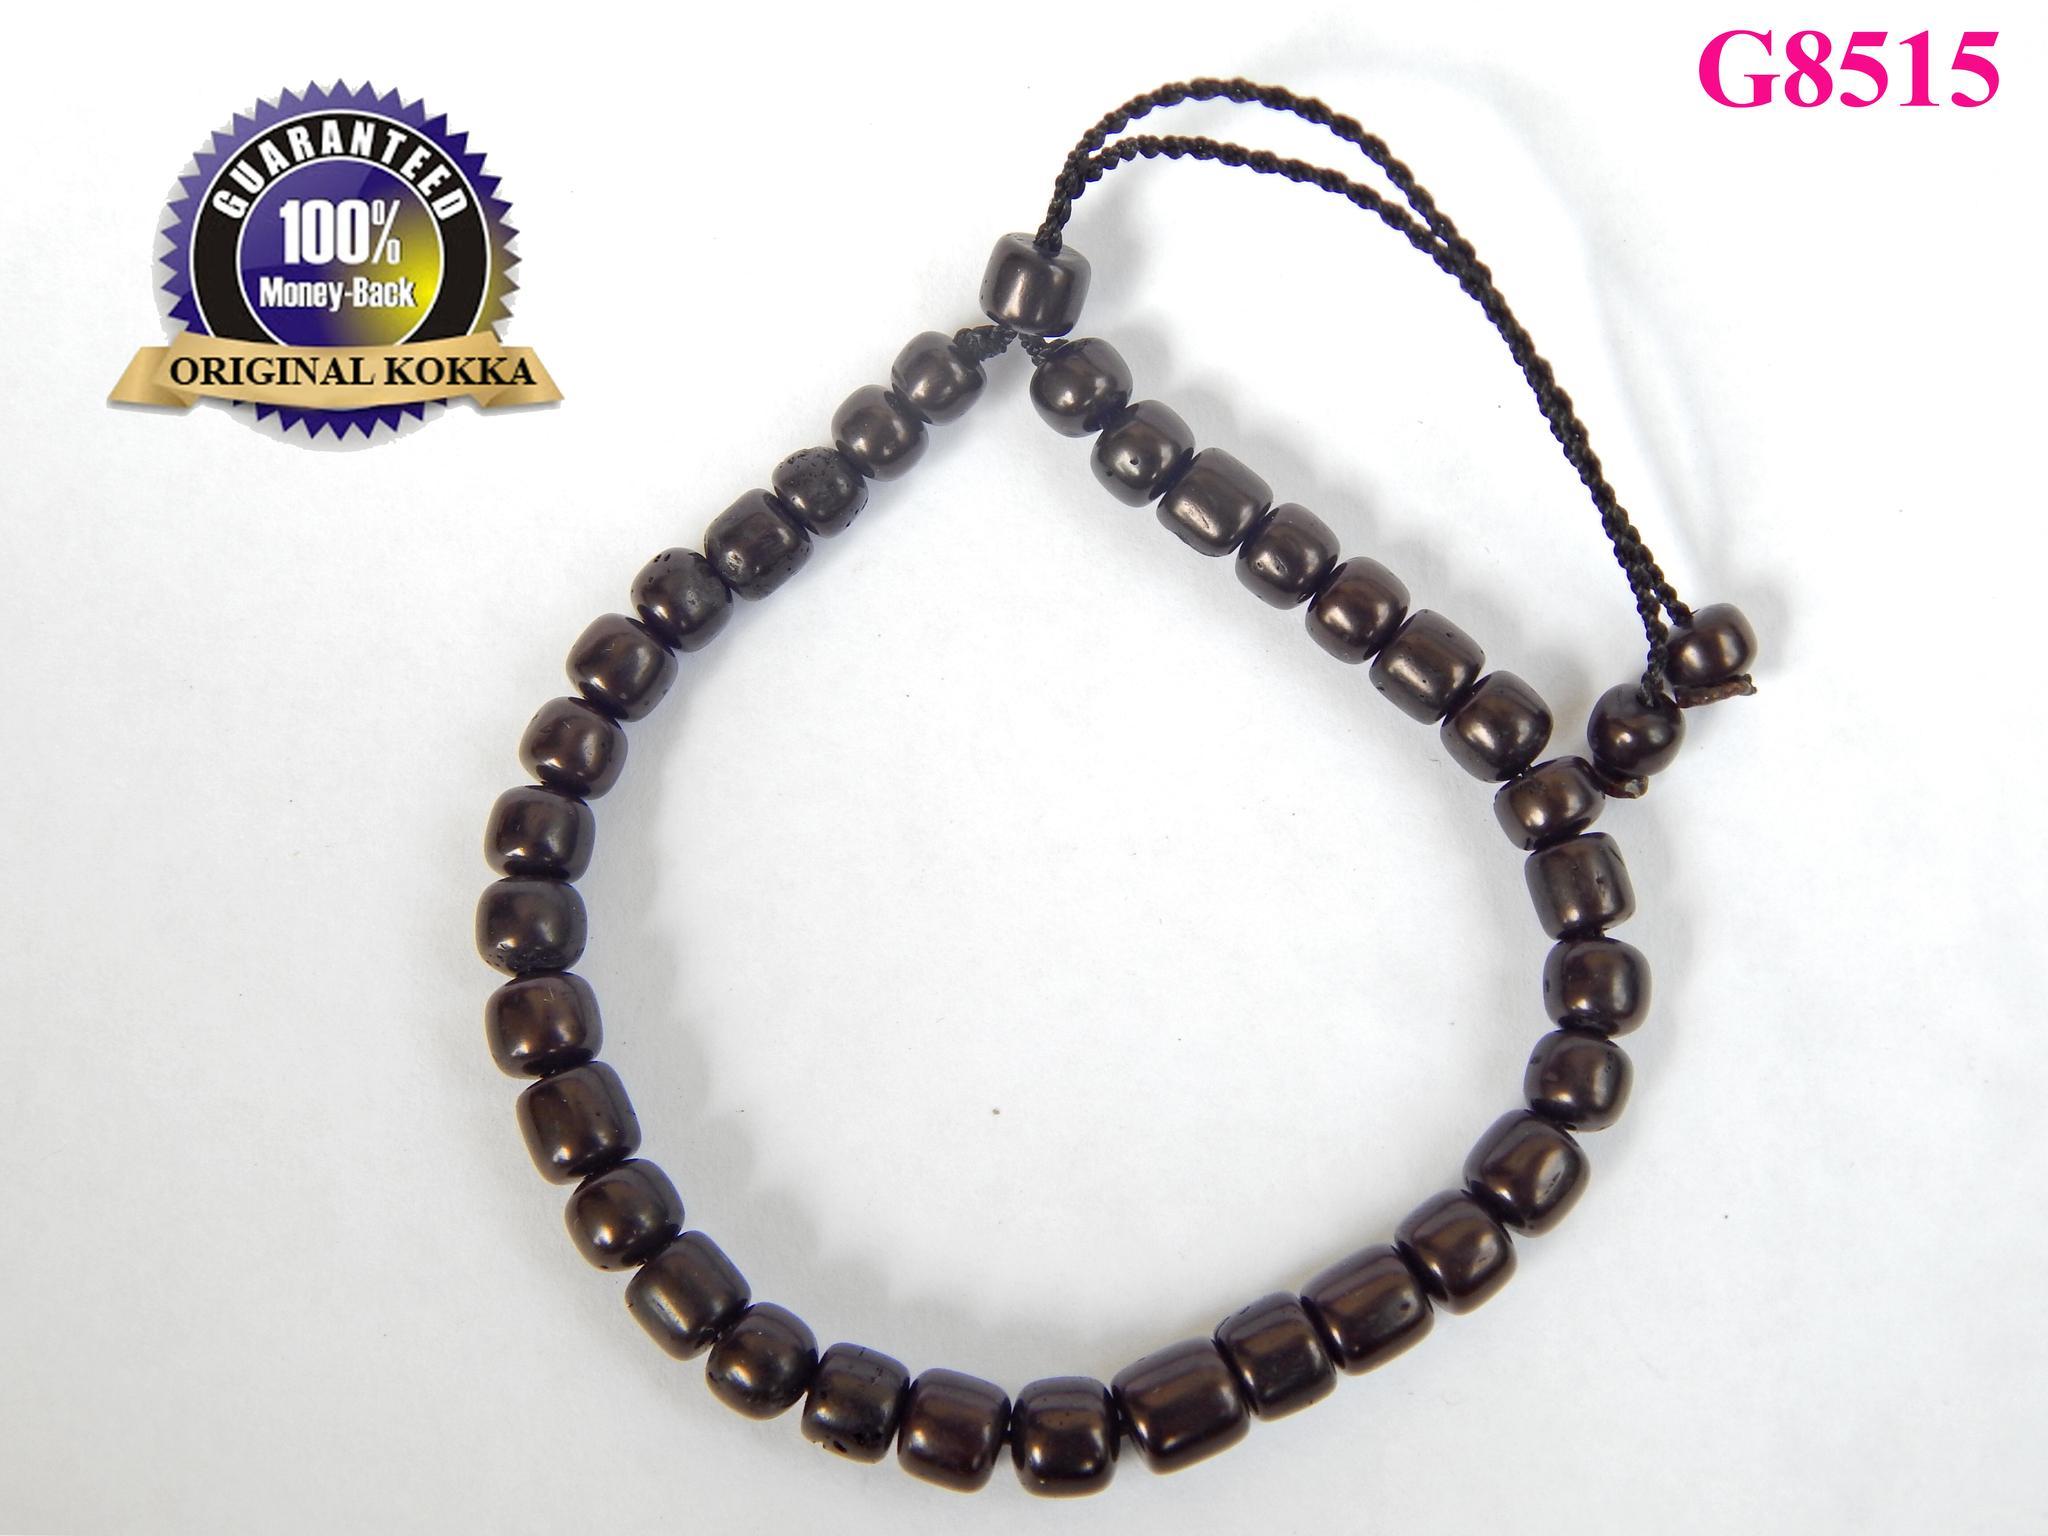 Diskon Promo Perhiasan Aksesoris G8515 gelang kayu kokka warna hitam kokkah koka kokah kauka Murah